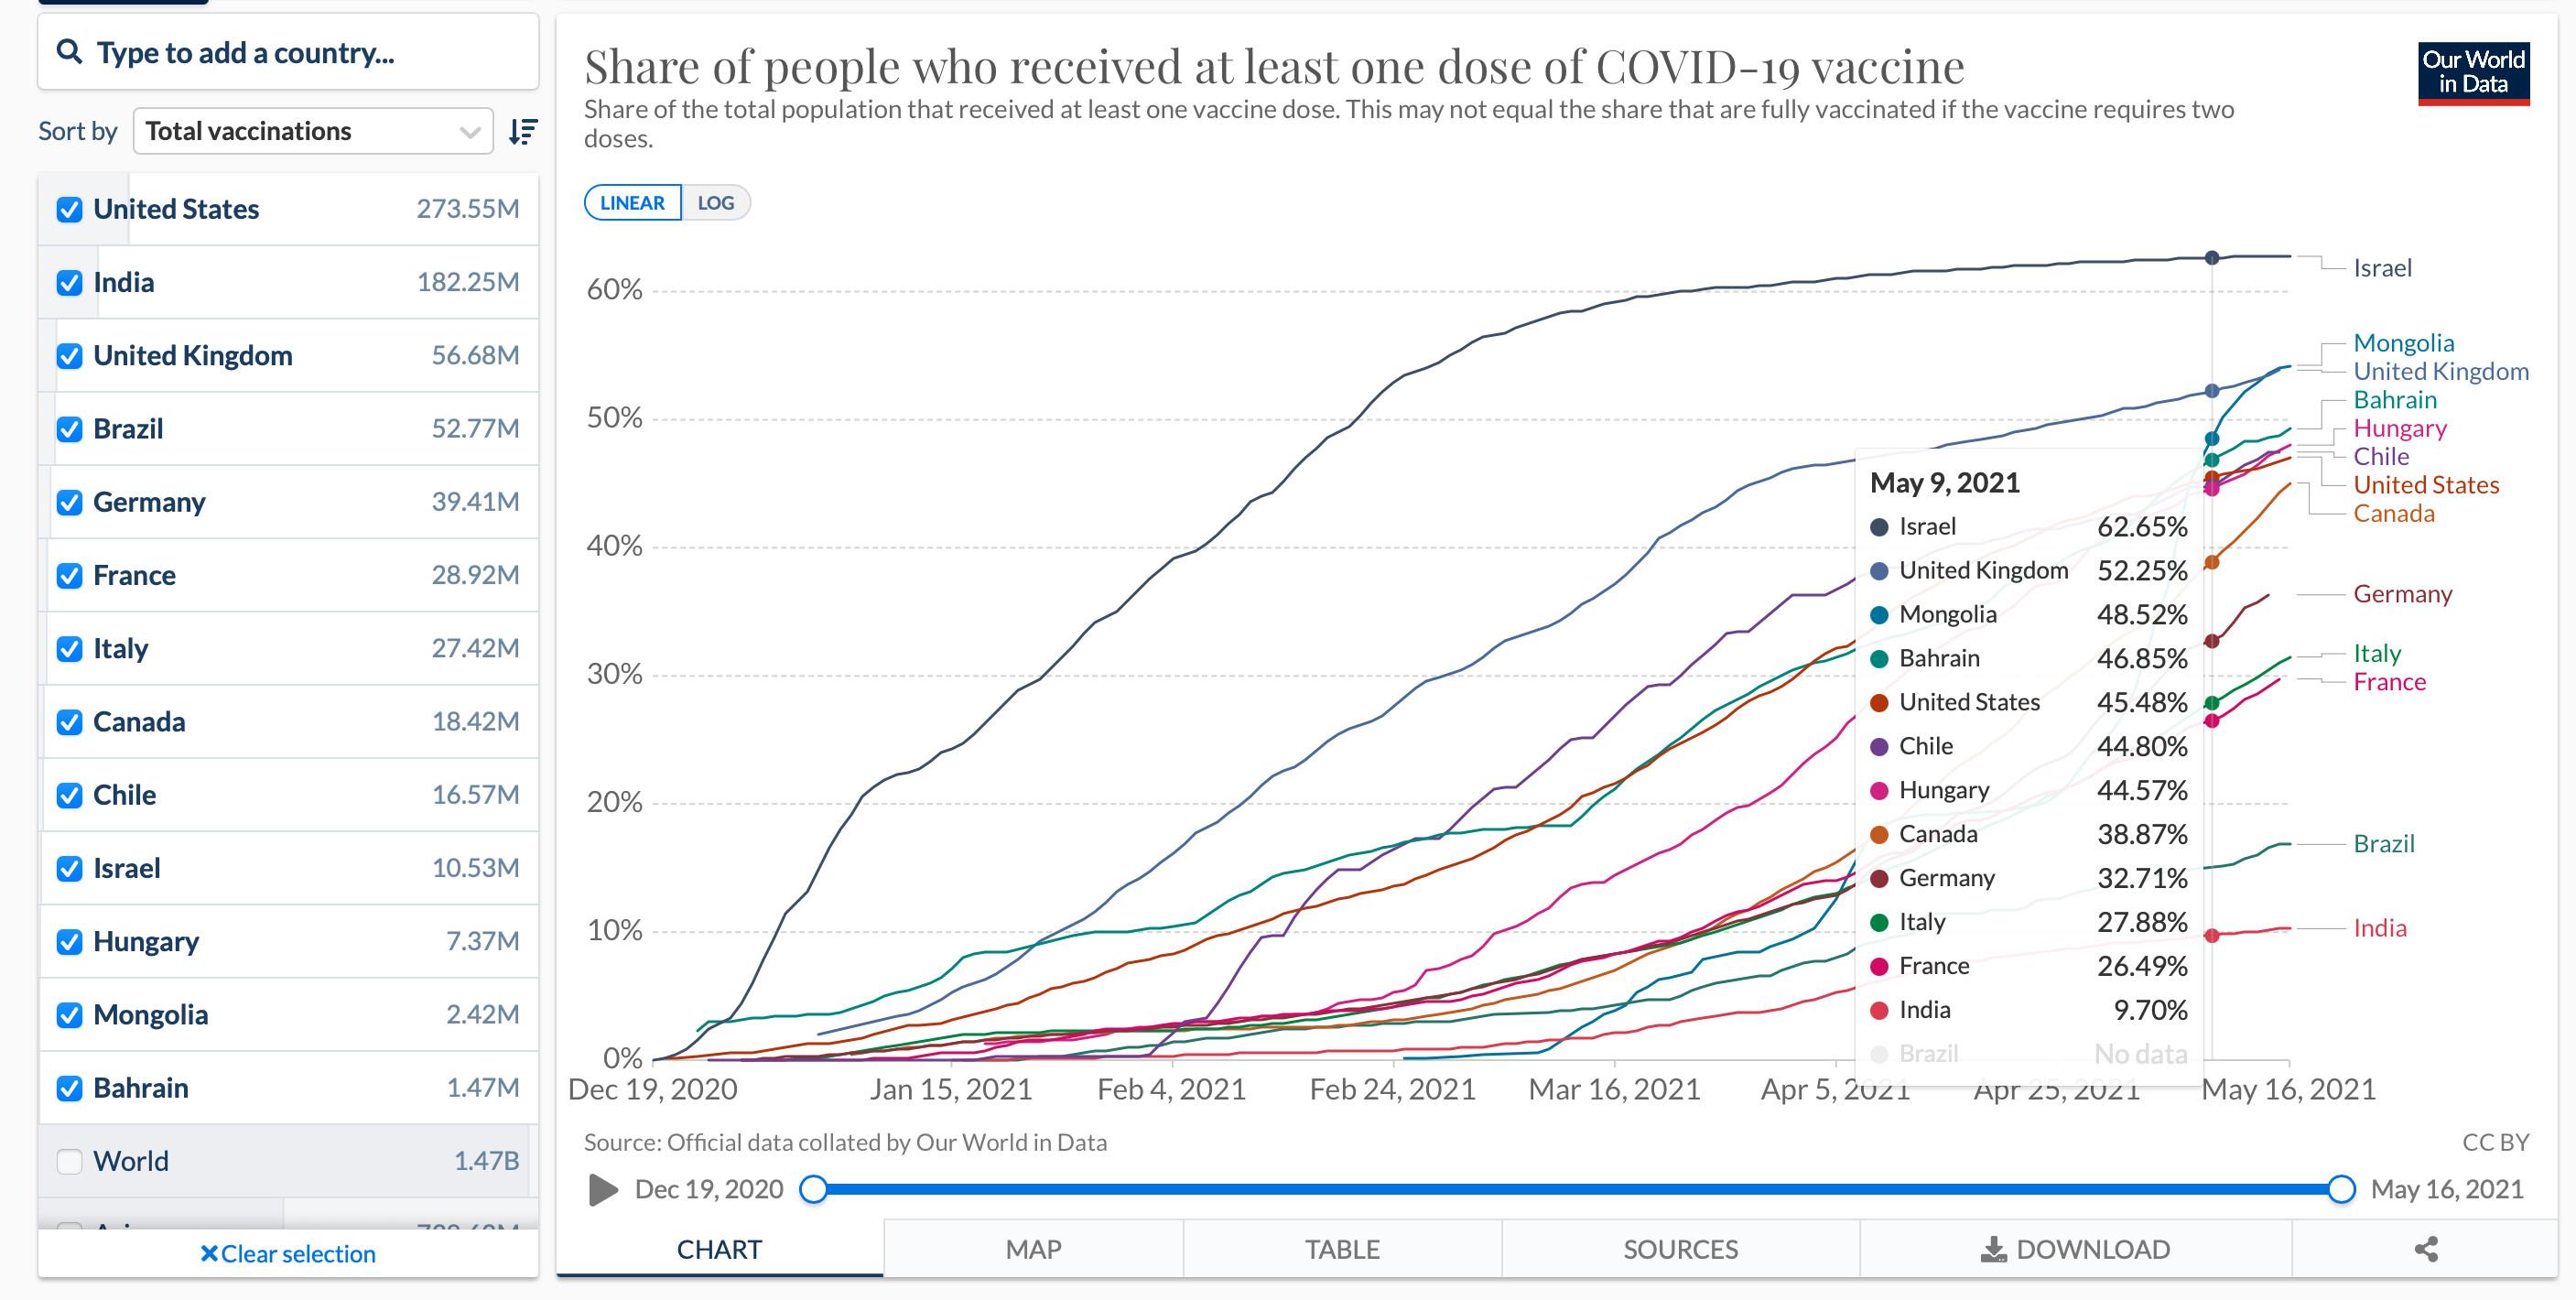 COVID-19,世界衛生組織,封城,經濟,抗疫,人工智慧,大數據分析,數位防疫,紓困,振興,台灣價值,社交距離,居家隔離,口罩,疫苗,邊境檢疫,群聚